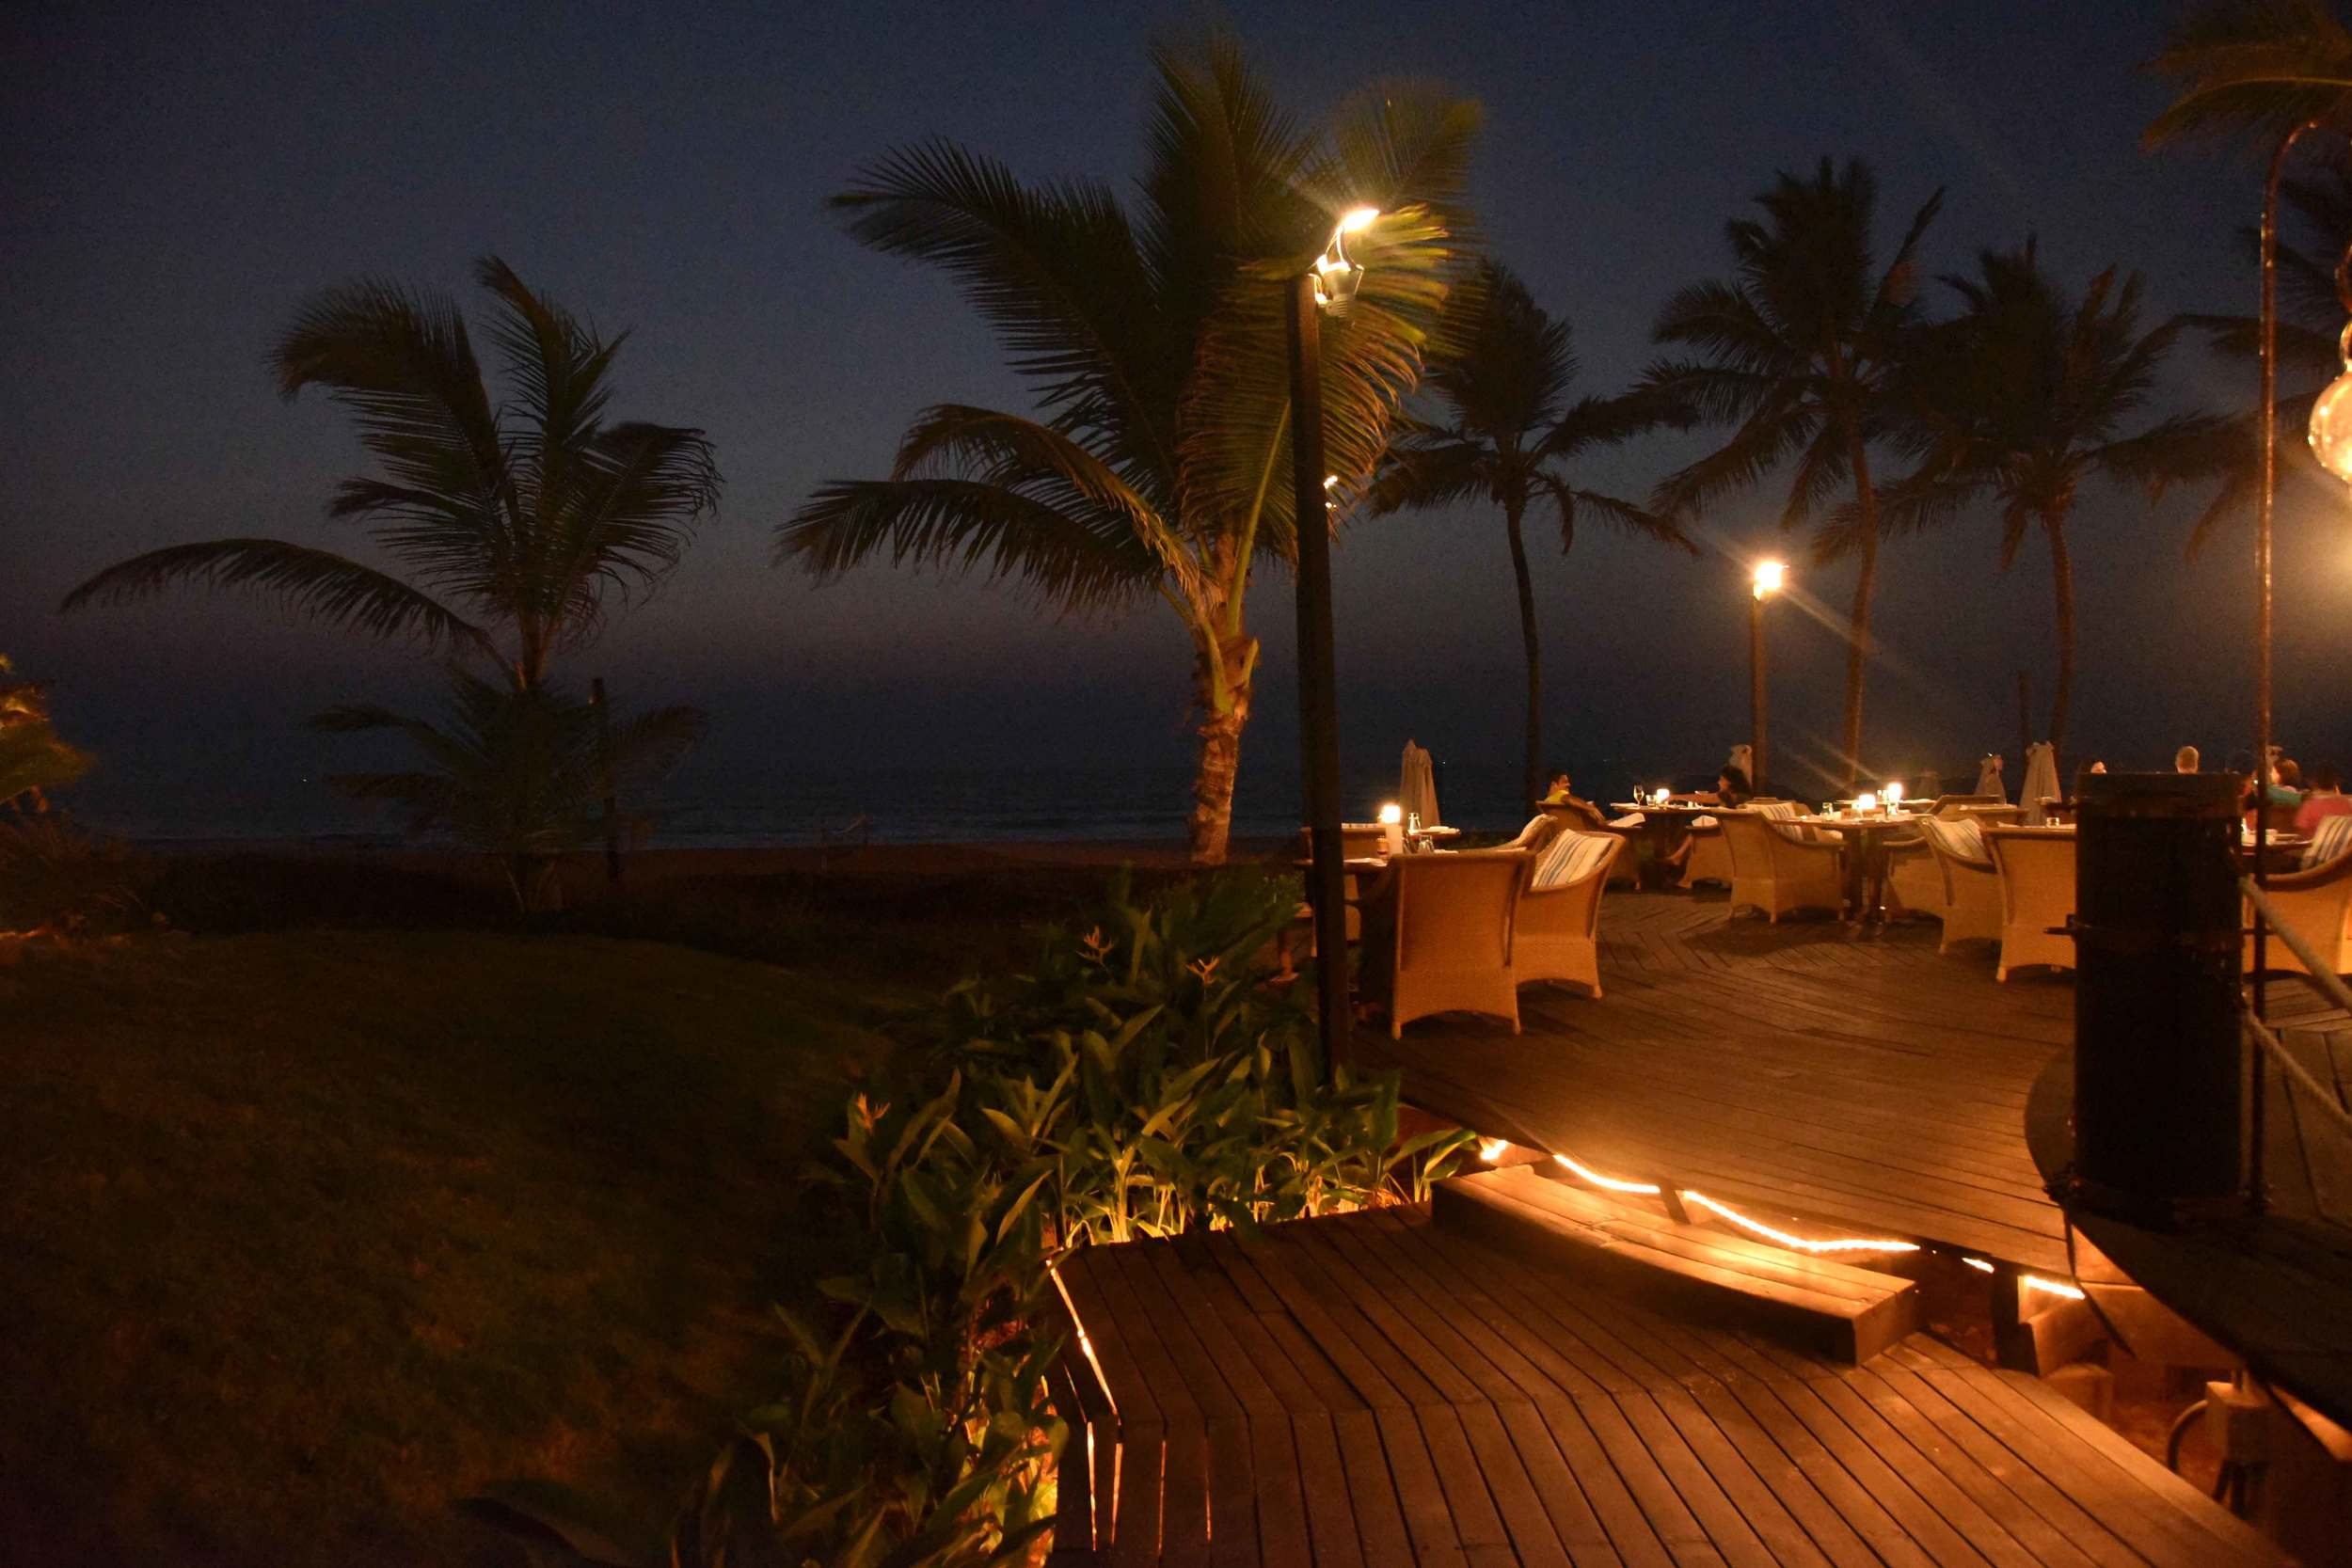 Dining at the beach restaurant, Park Hyatt Hotel, Goa, image©sourcingstyle.com.